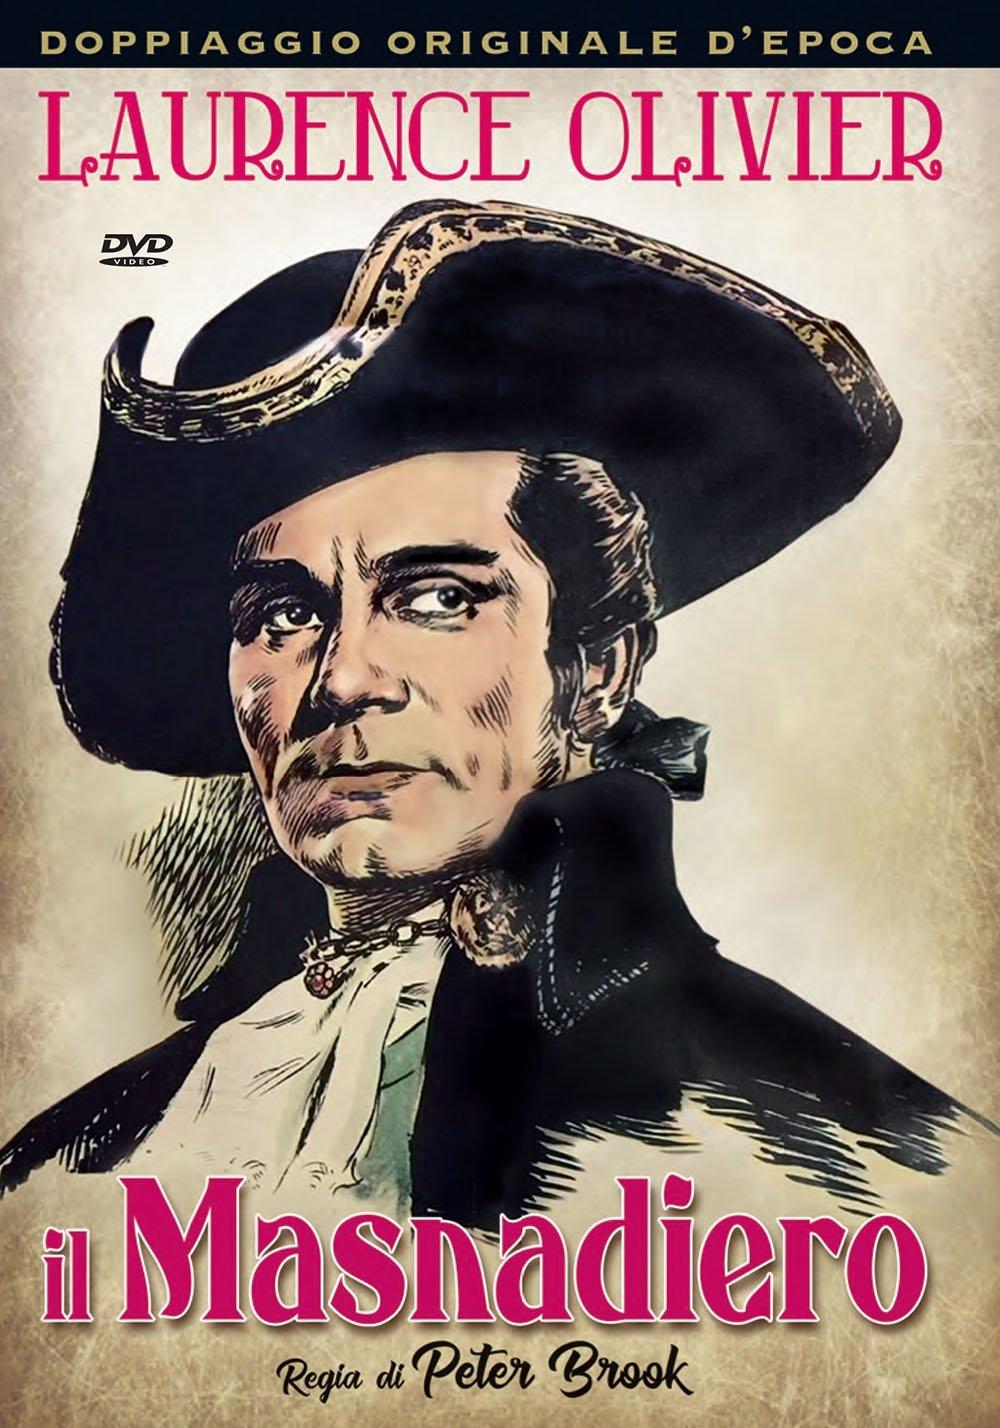 IL MASNADIERO (DVD)